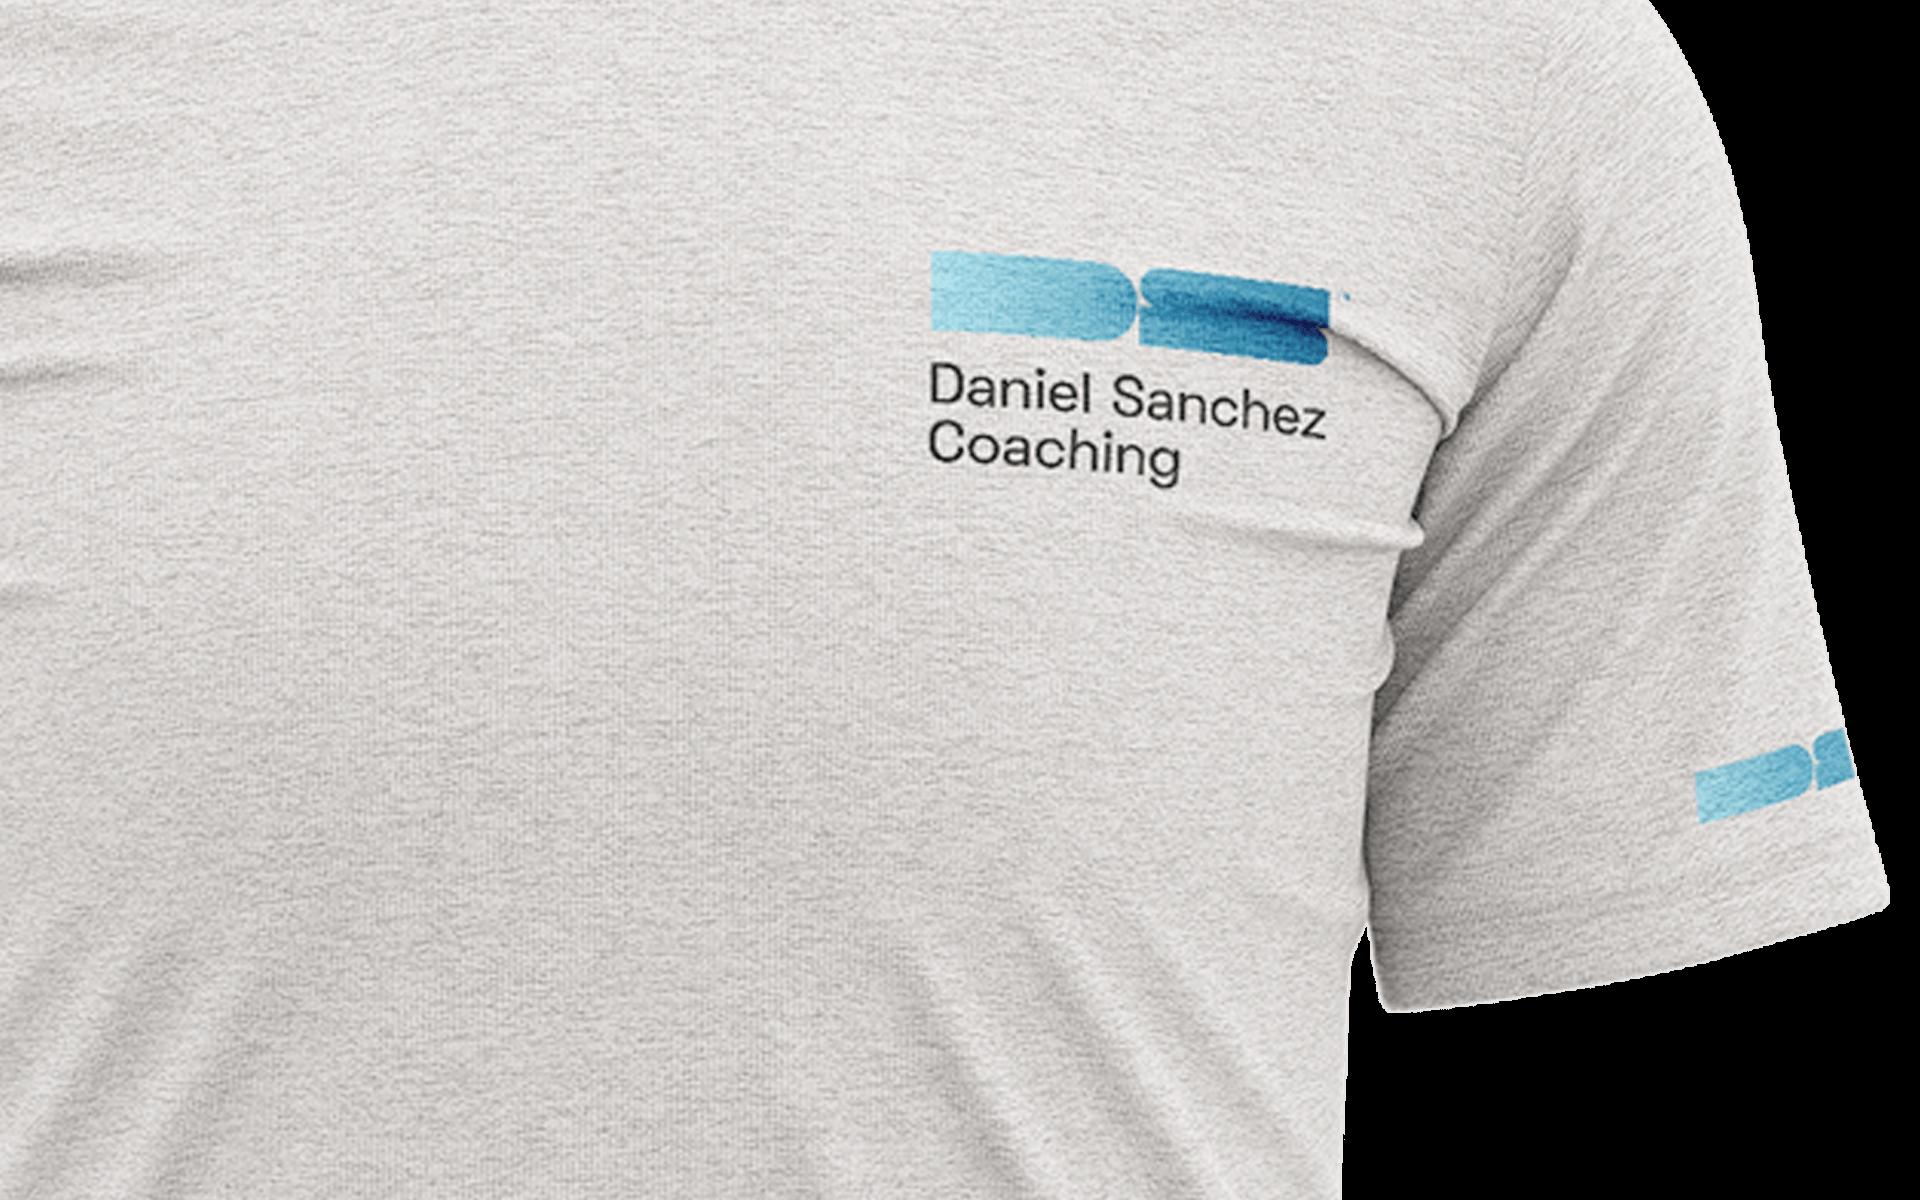 Branded t-shirt for Daniel Sanchez' personal training business